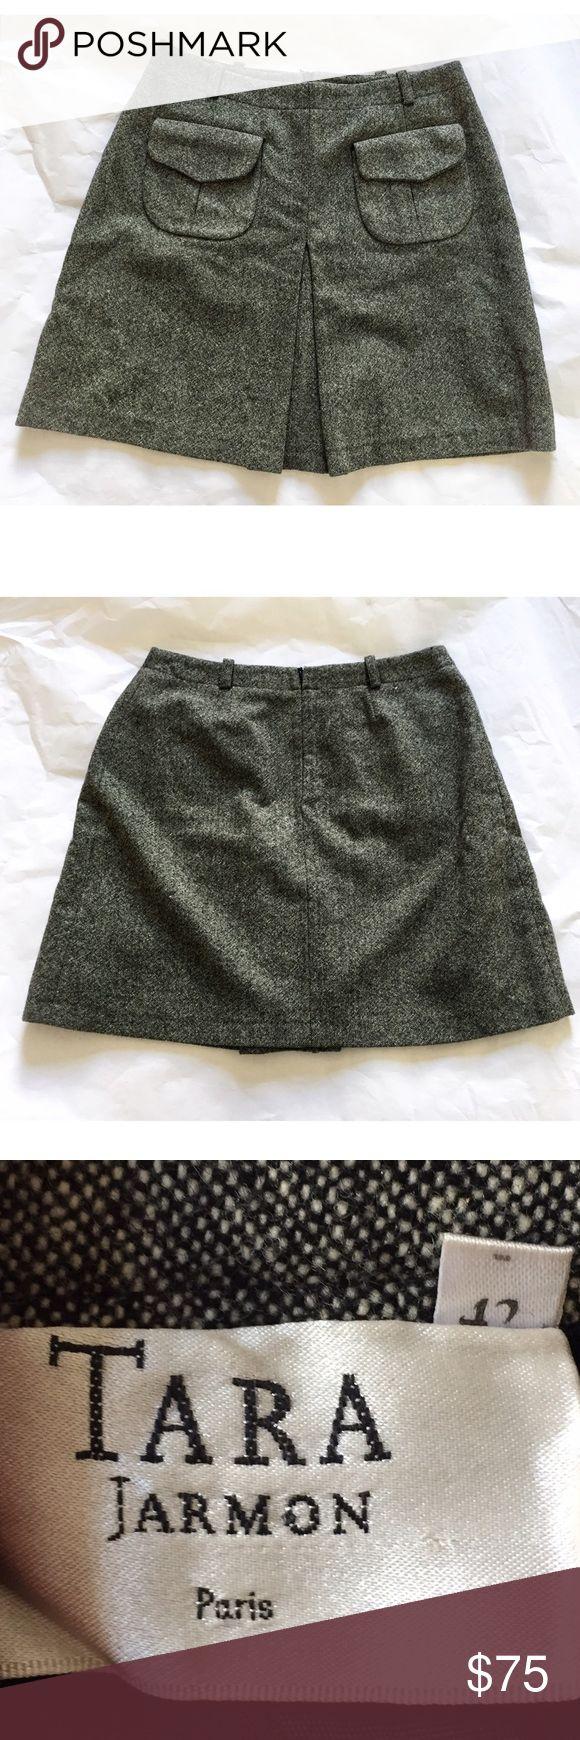 "Tara Jarmon Wool Skirt Tara Jarmon tweed skirt. In wool/mohair mix. French size 42. Length about 17.5"" waist about 14.75 per side.  Made in France. Tara Jarmon Skirts"